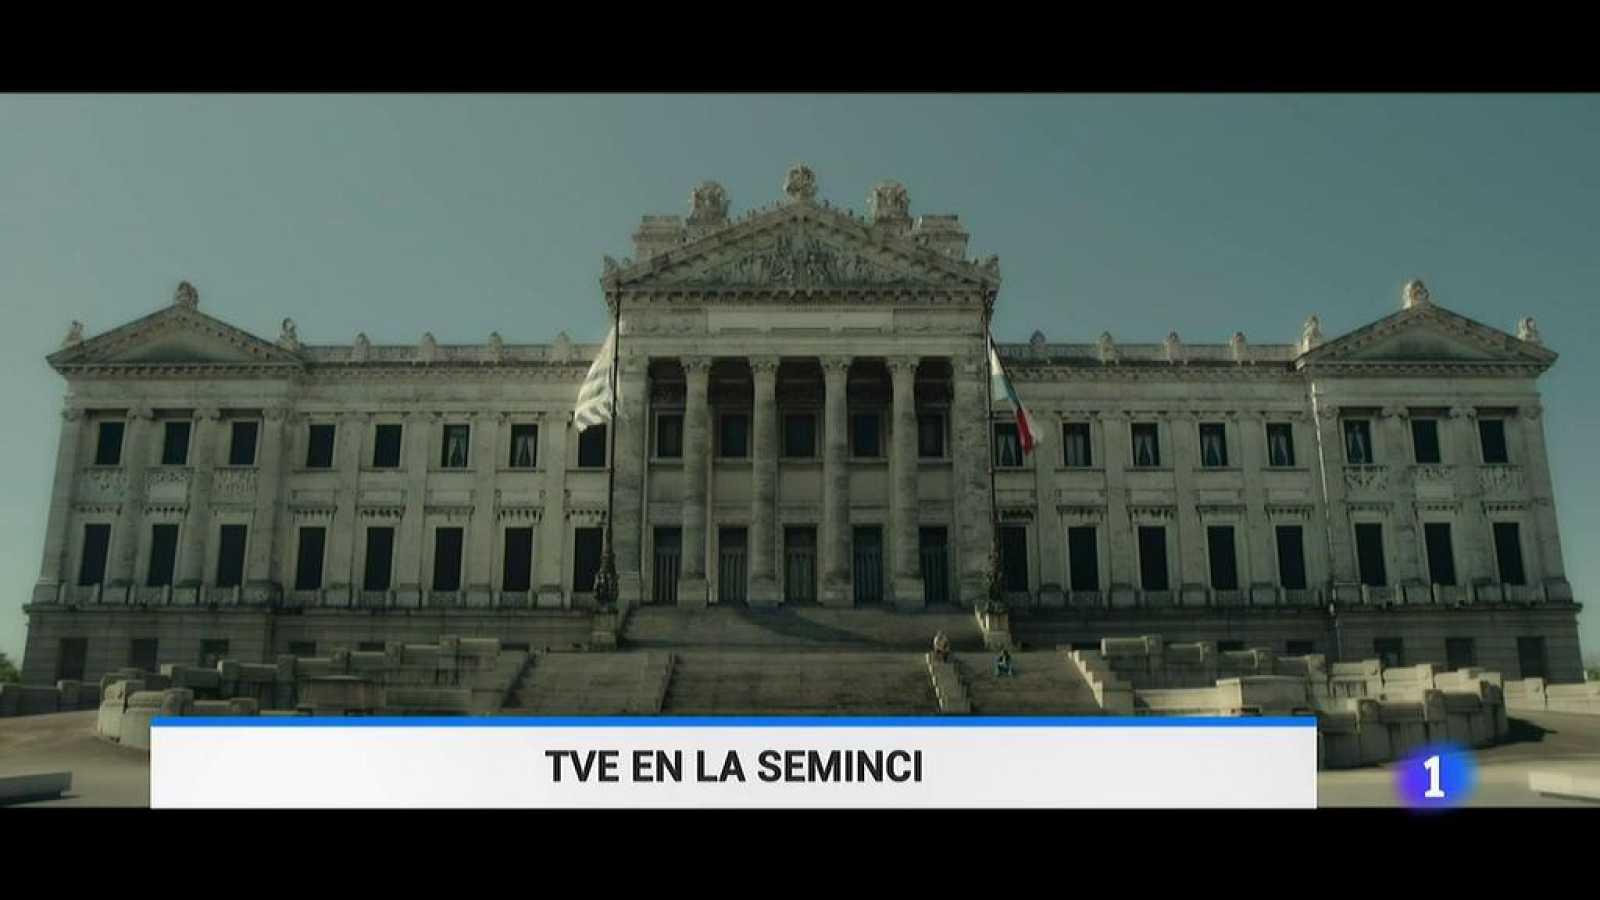 TVE en la Seminci